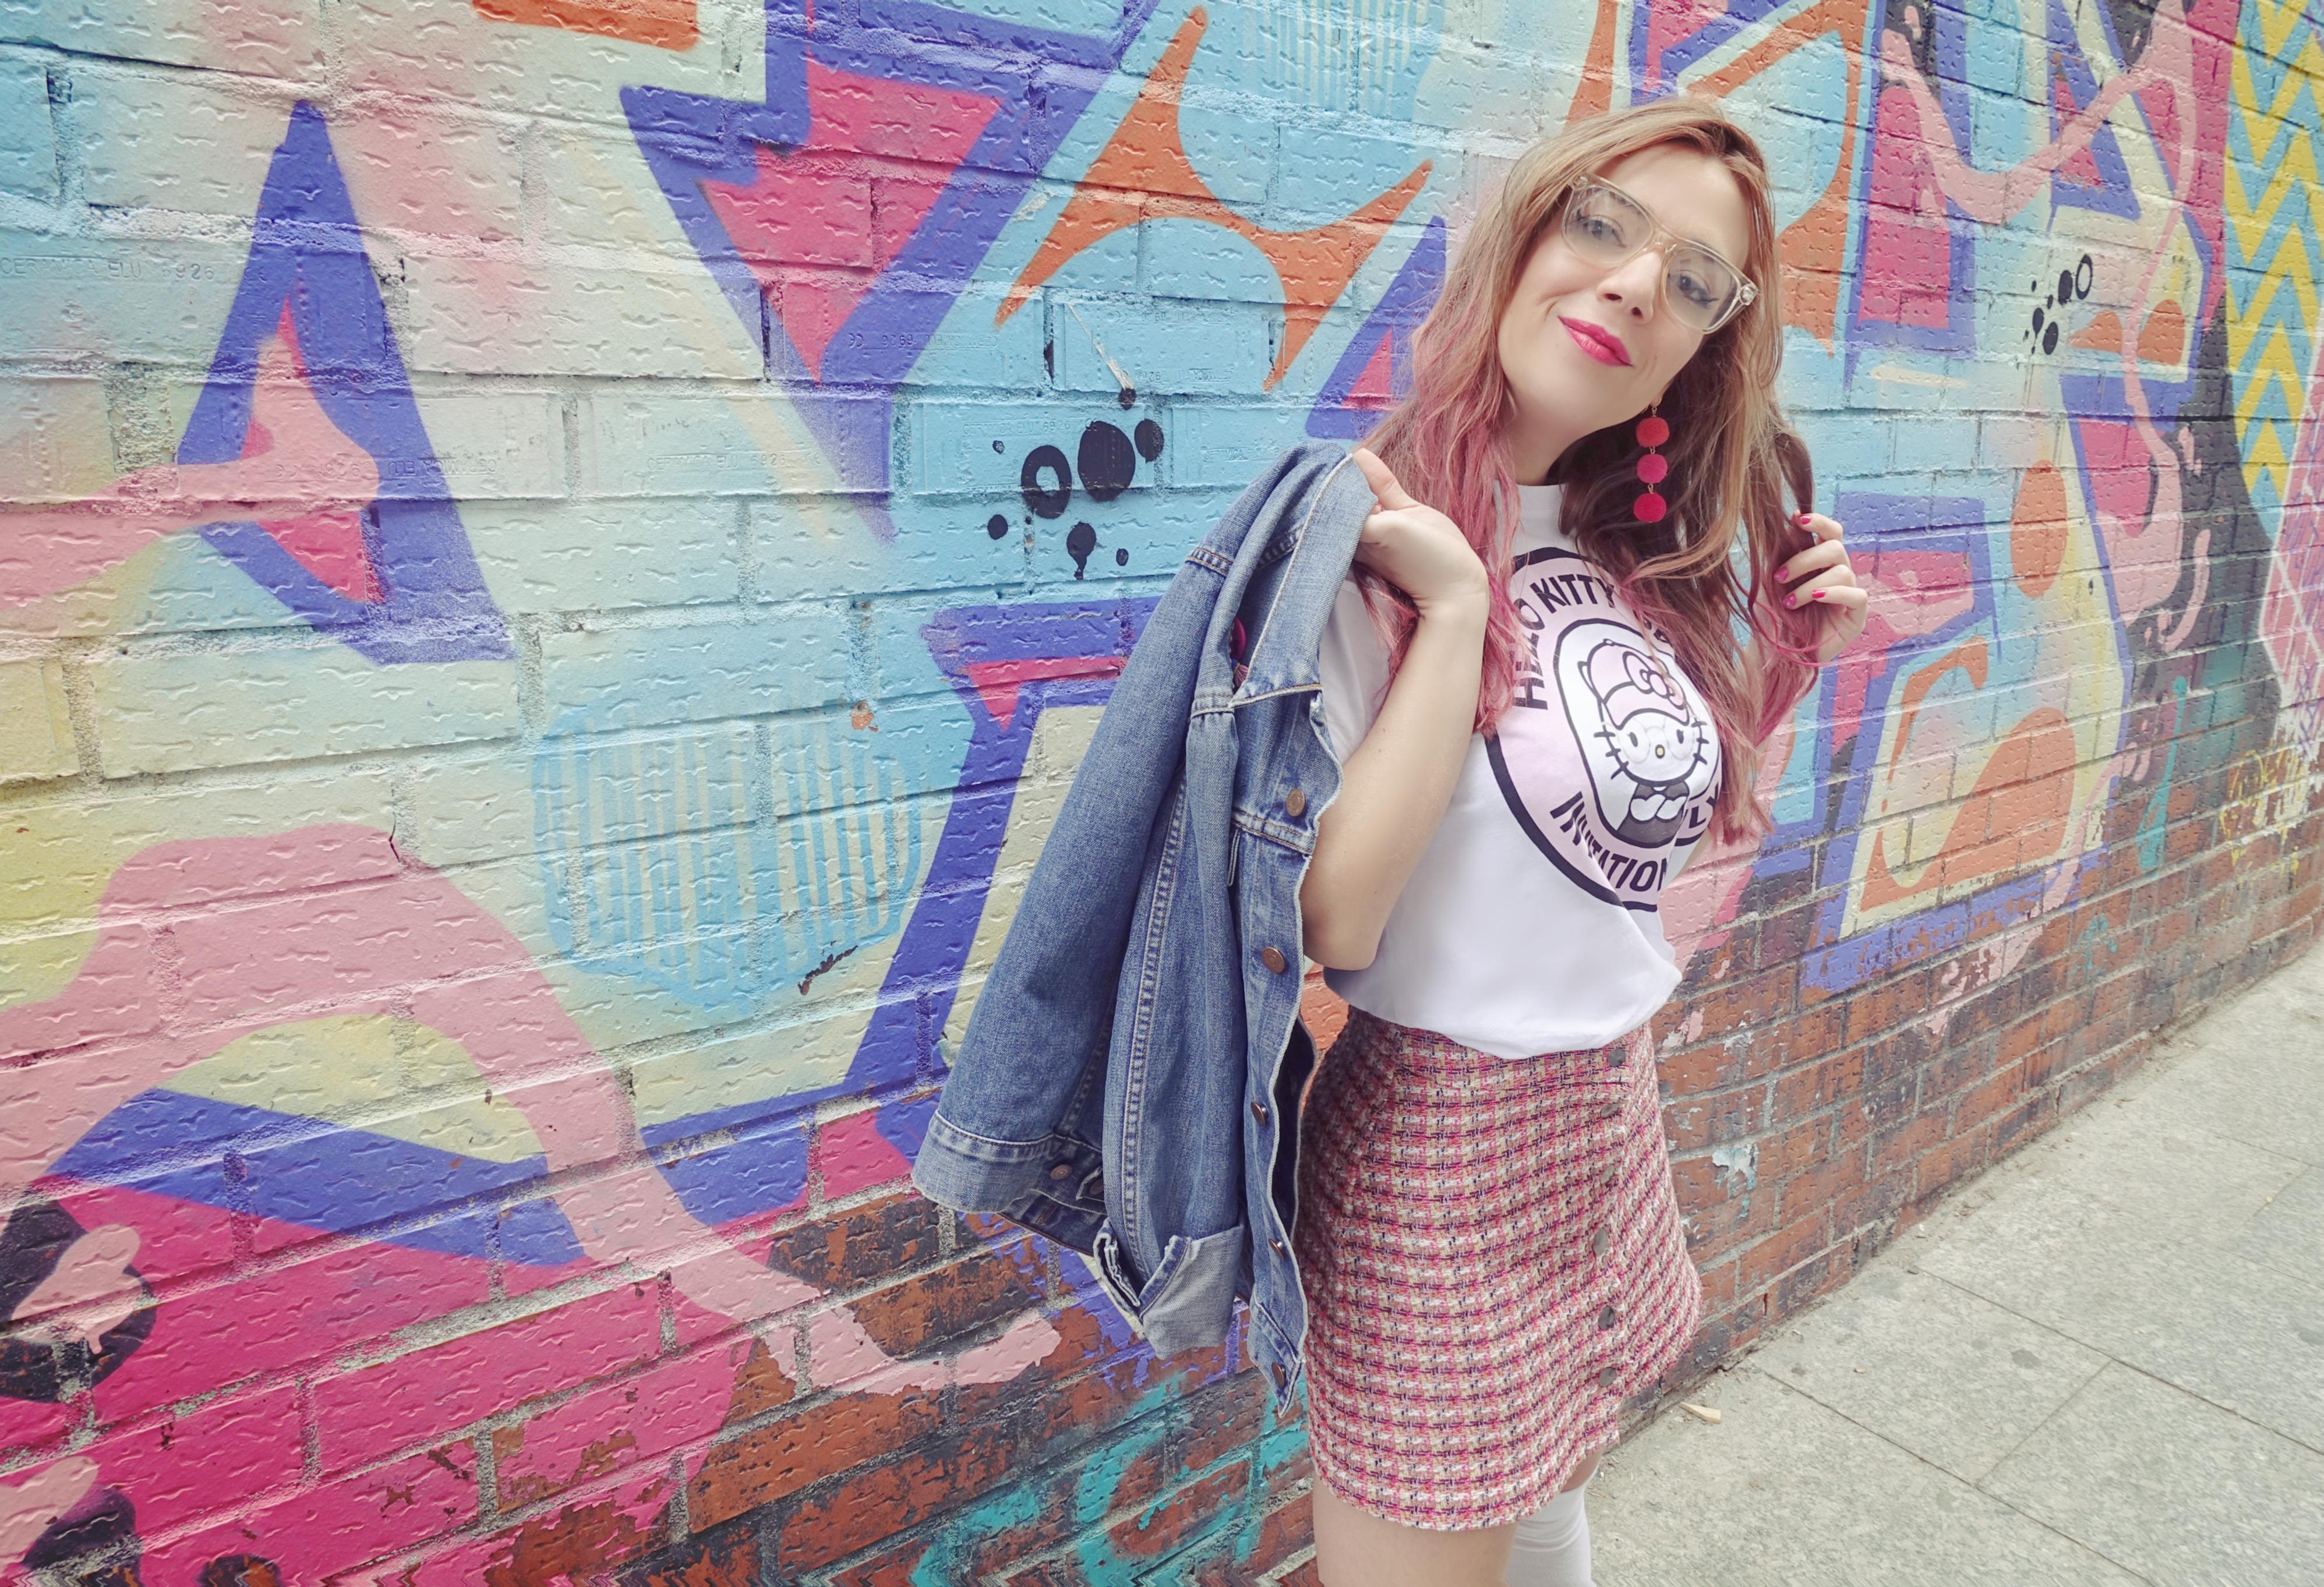 Clueless-look-ChicAdicta-blog-de-moda-PiensaenChic-Chic-Adicta-influencer-madrid-falda-pata-de-gallo-pink-outfit